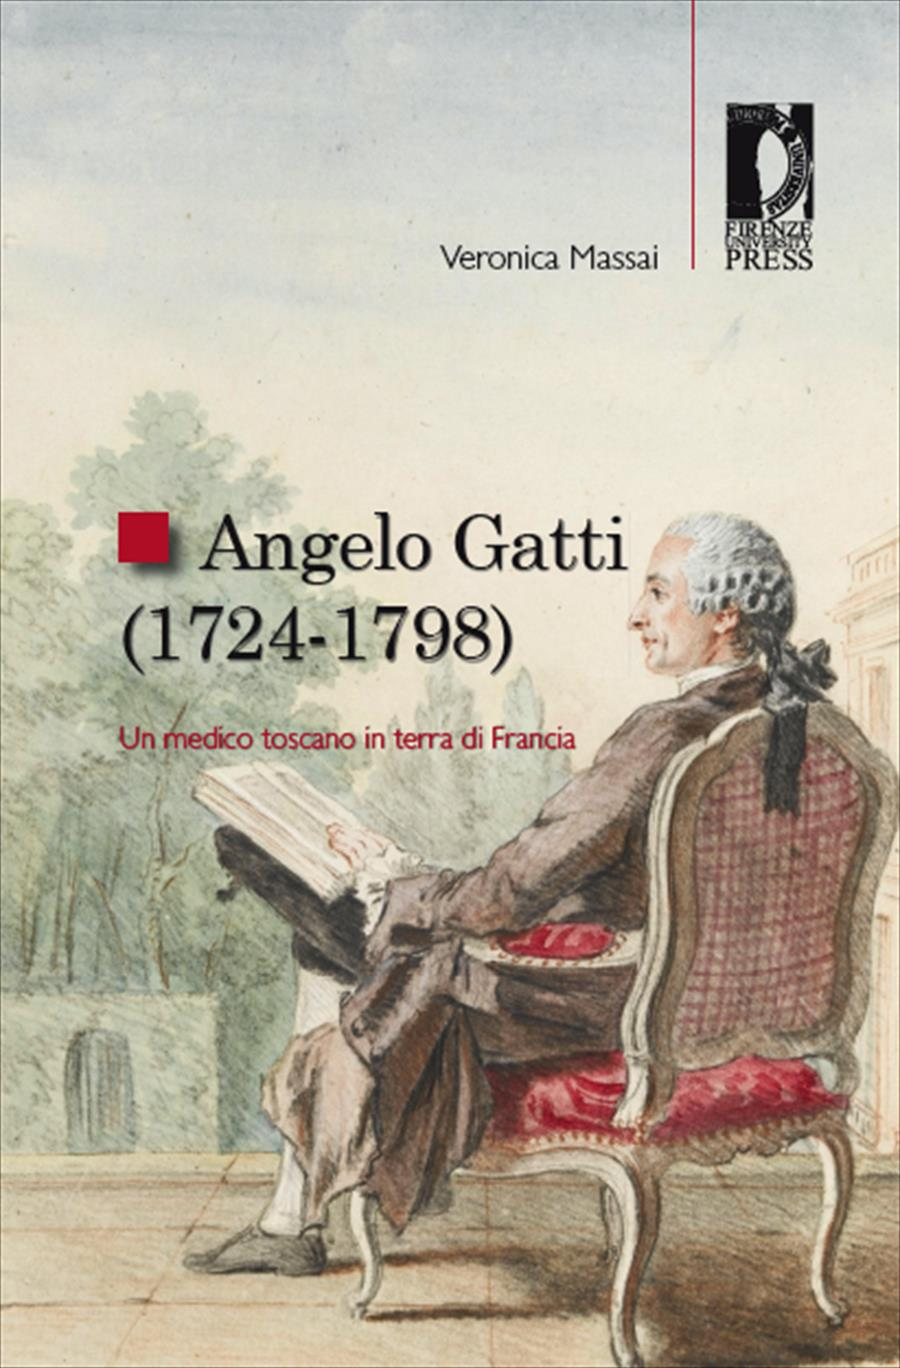 Angelo Gatti (1724-1798)